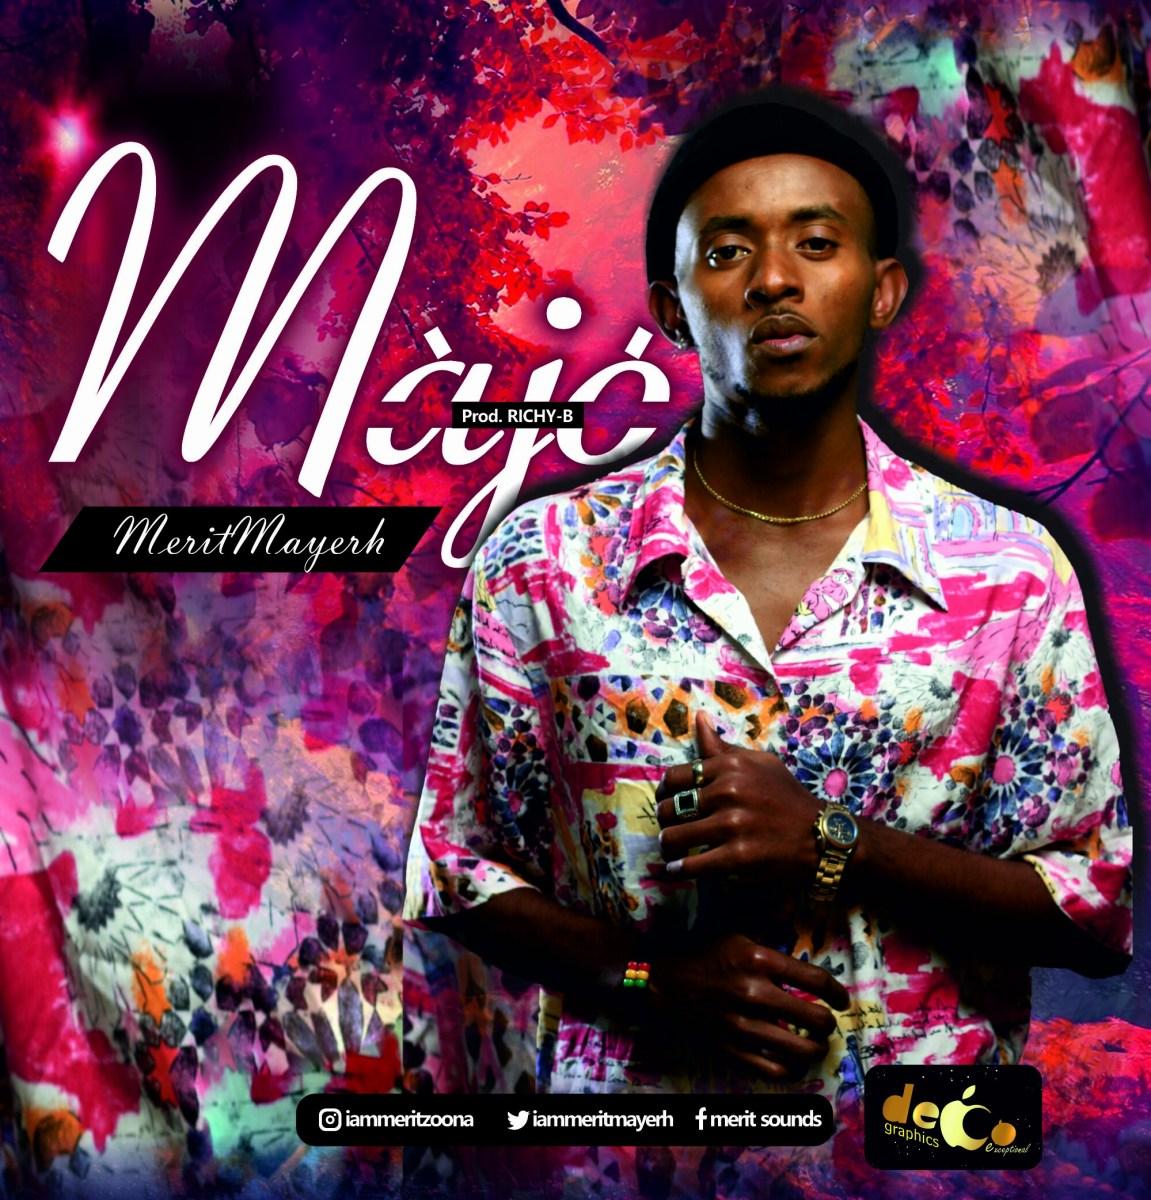 Music: Merit Meyerh - Majo